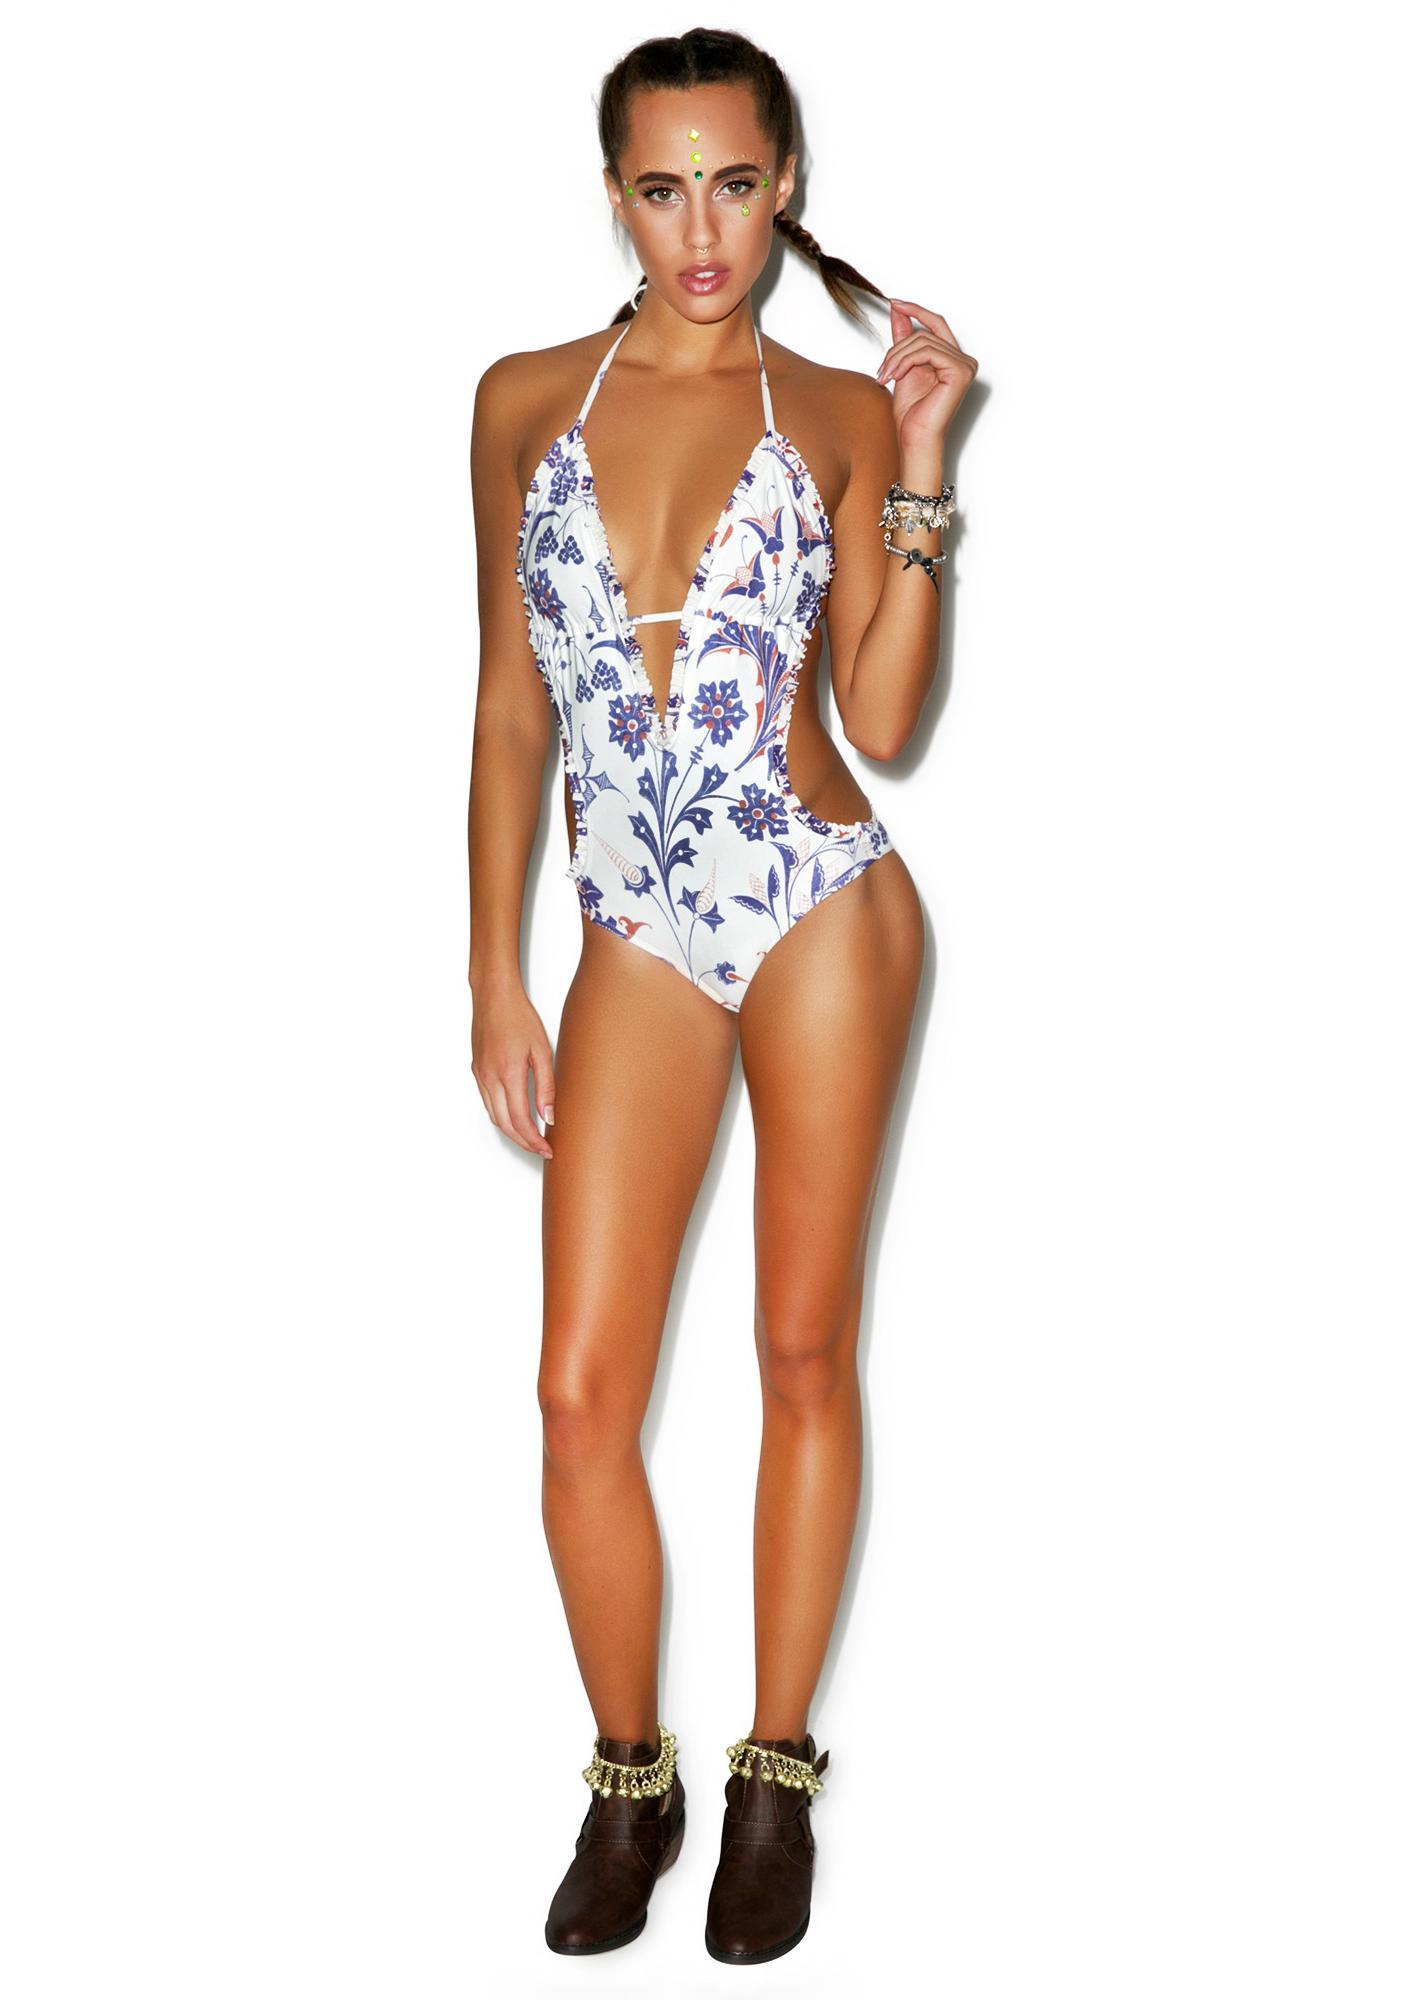 Wildfox Couture American Paisley Ruffled Monokini